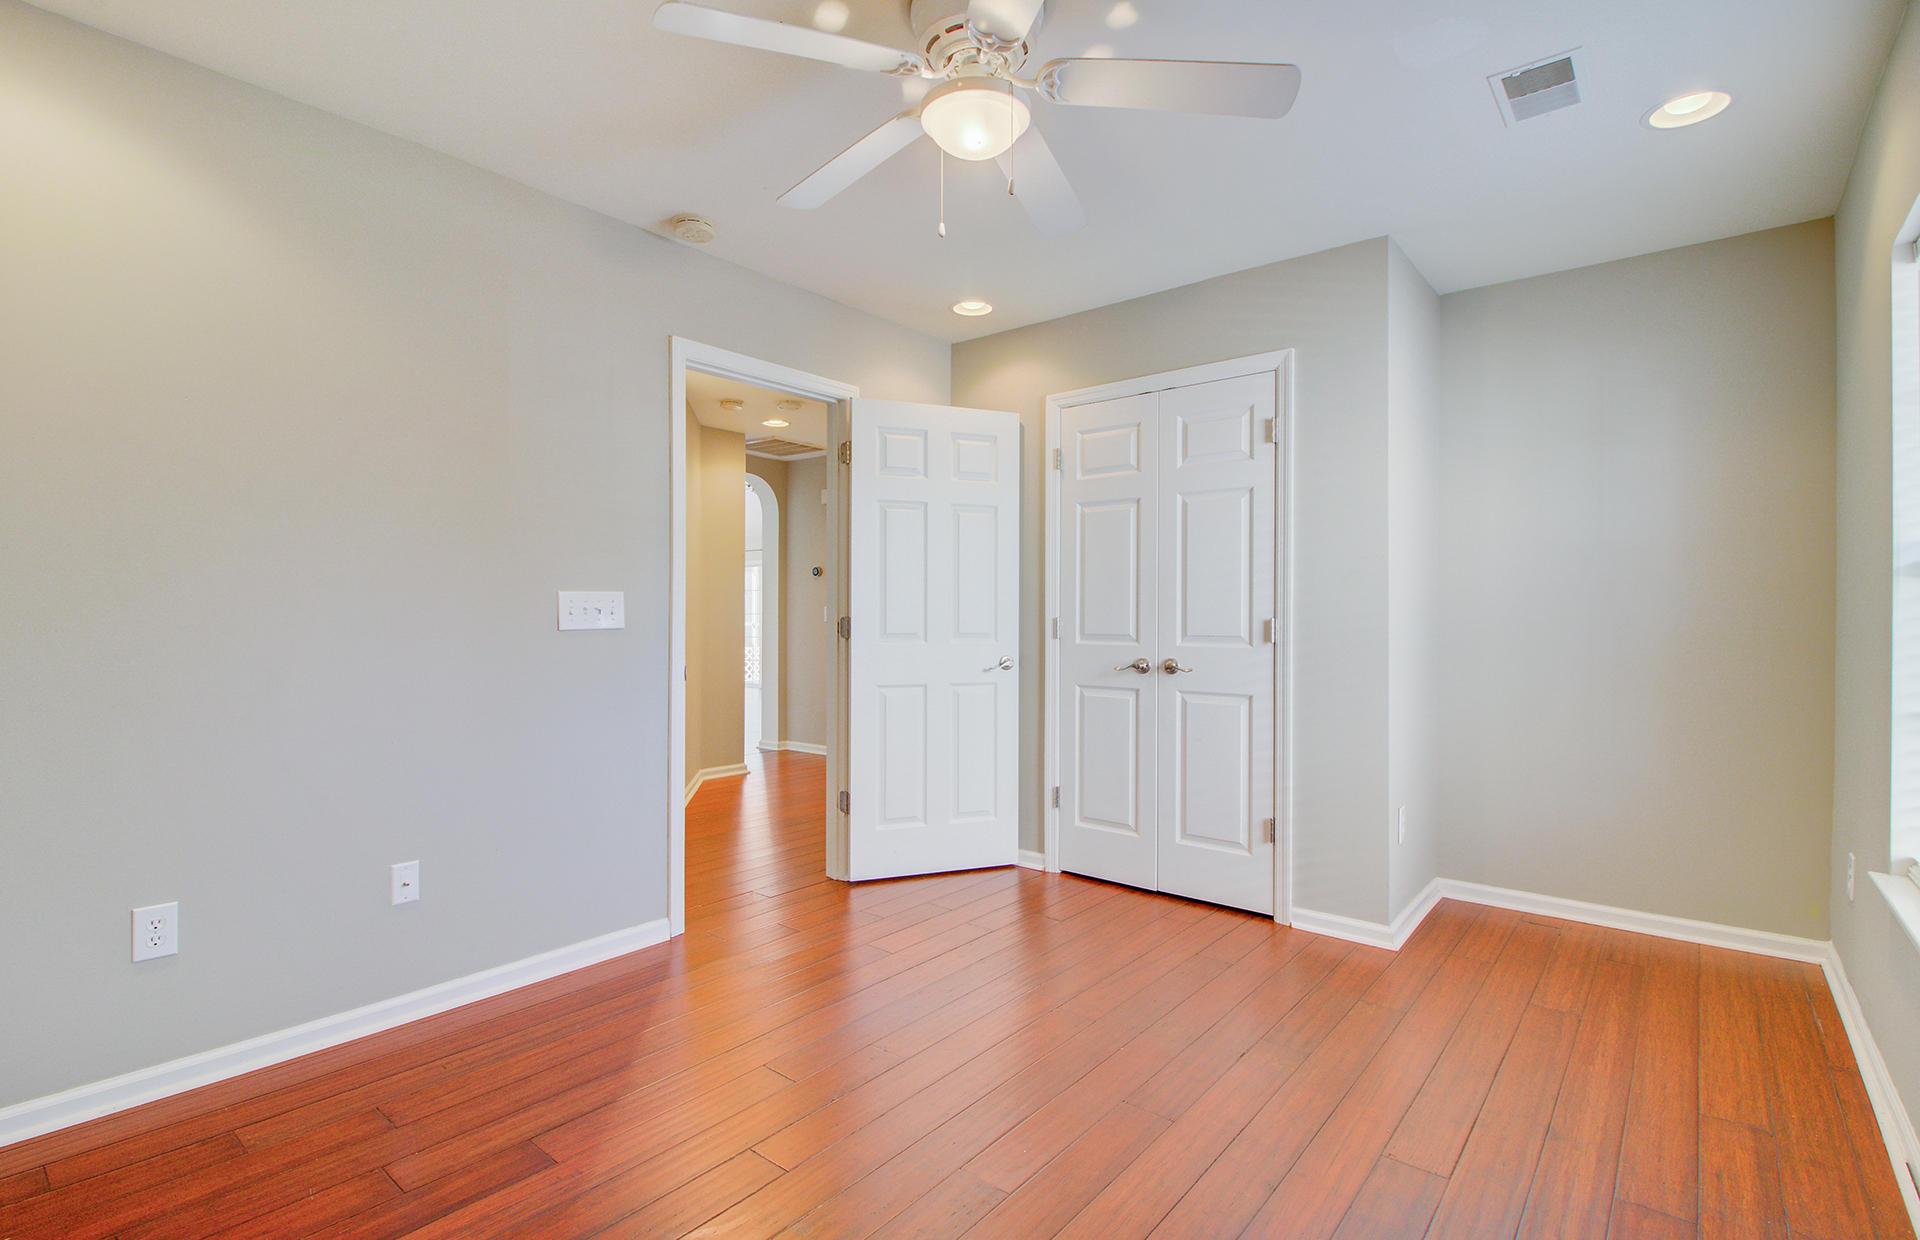 Grand Oaks Plantation Homes For Sale - 789 Bent Hickory, Charleston, SC - 22